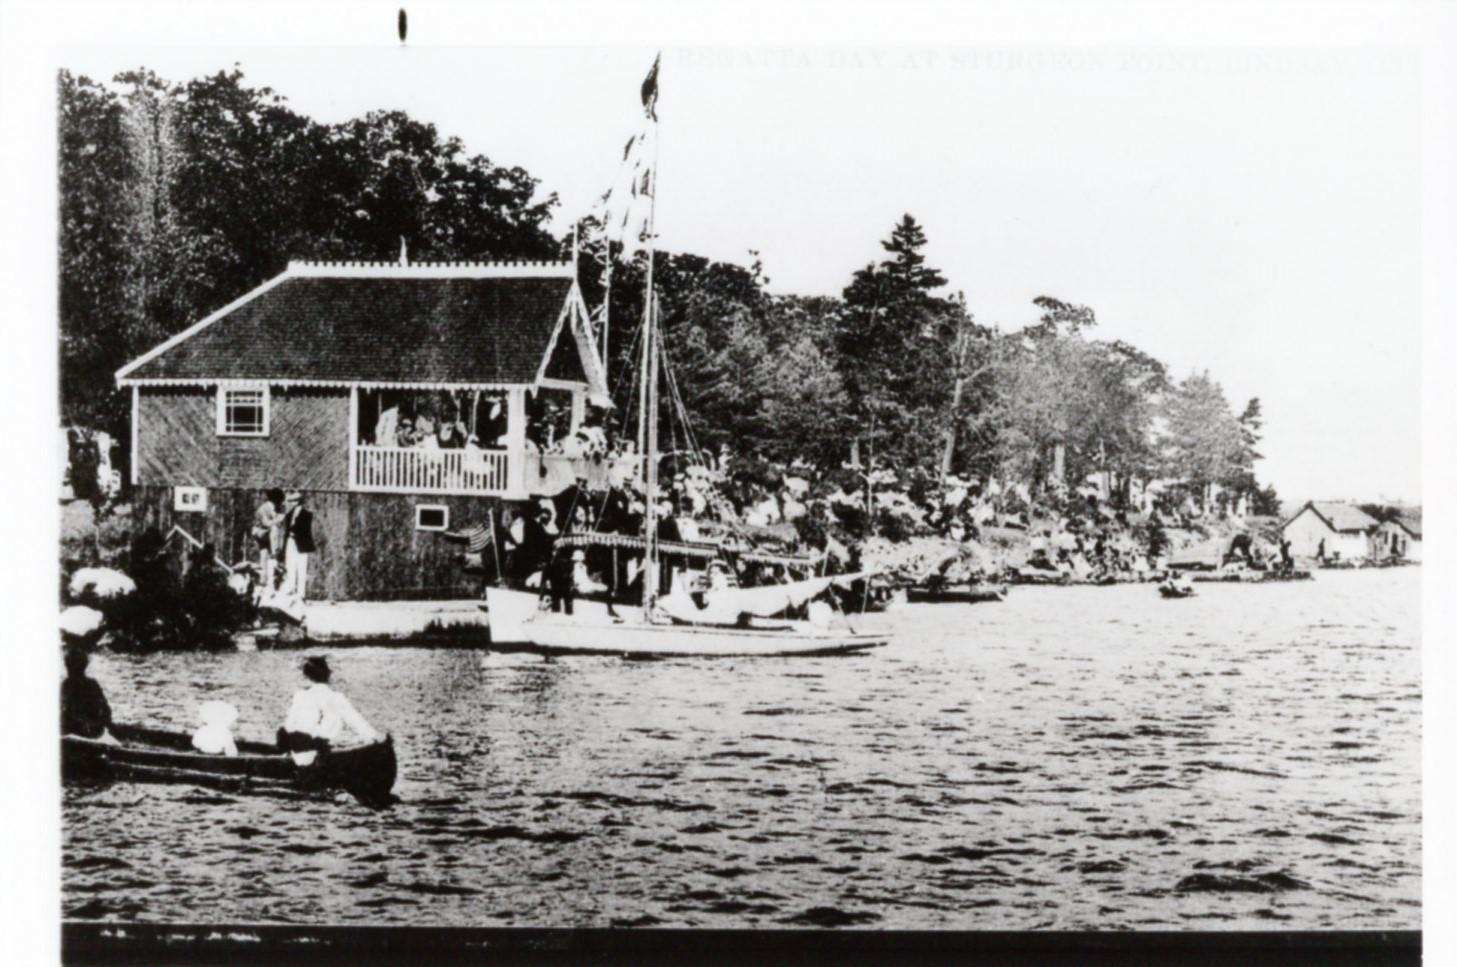 Sturgeon Point Regatta, 1906